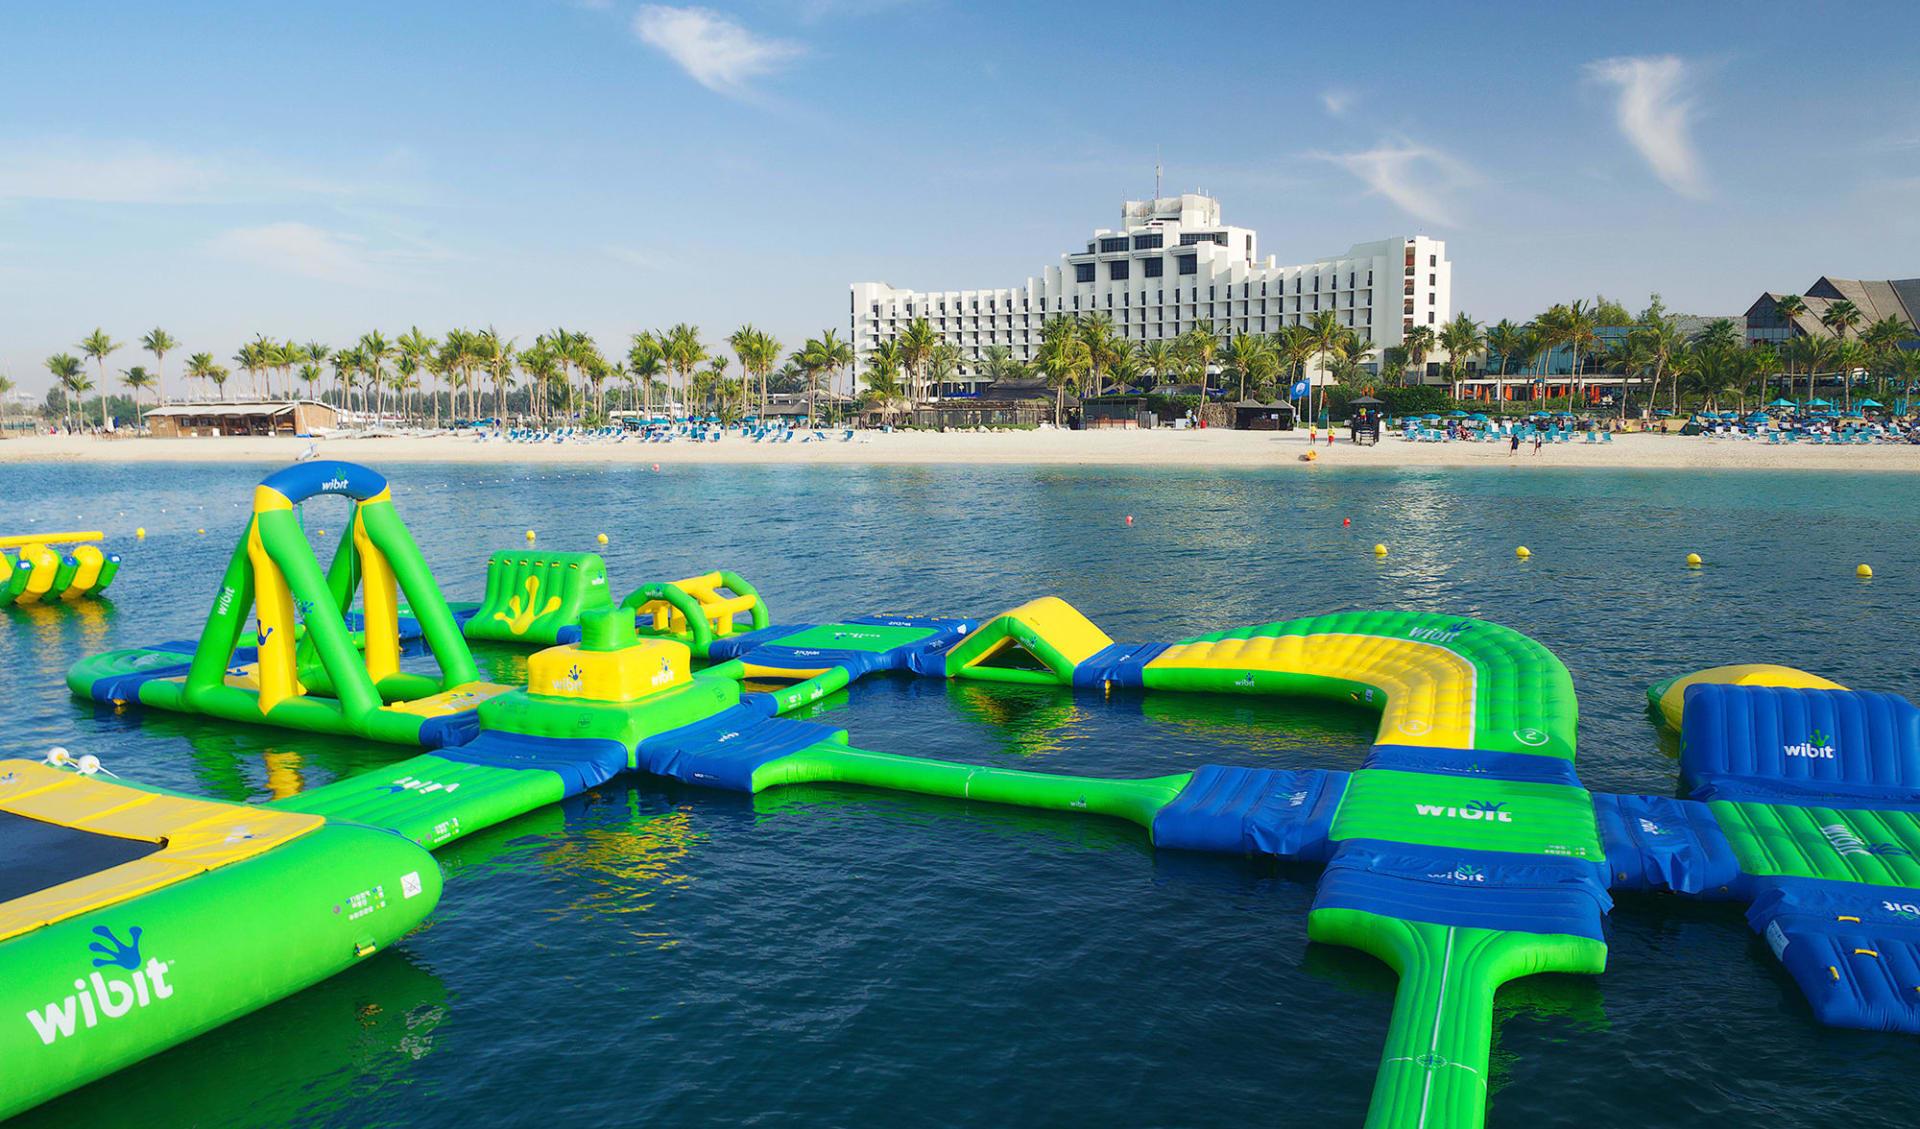 JA Beach Hotel in Dubai: